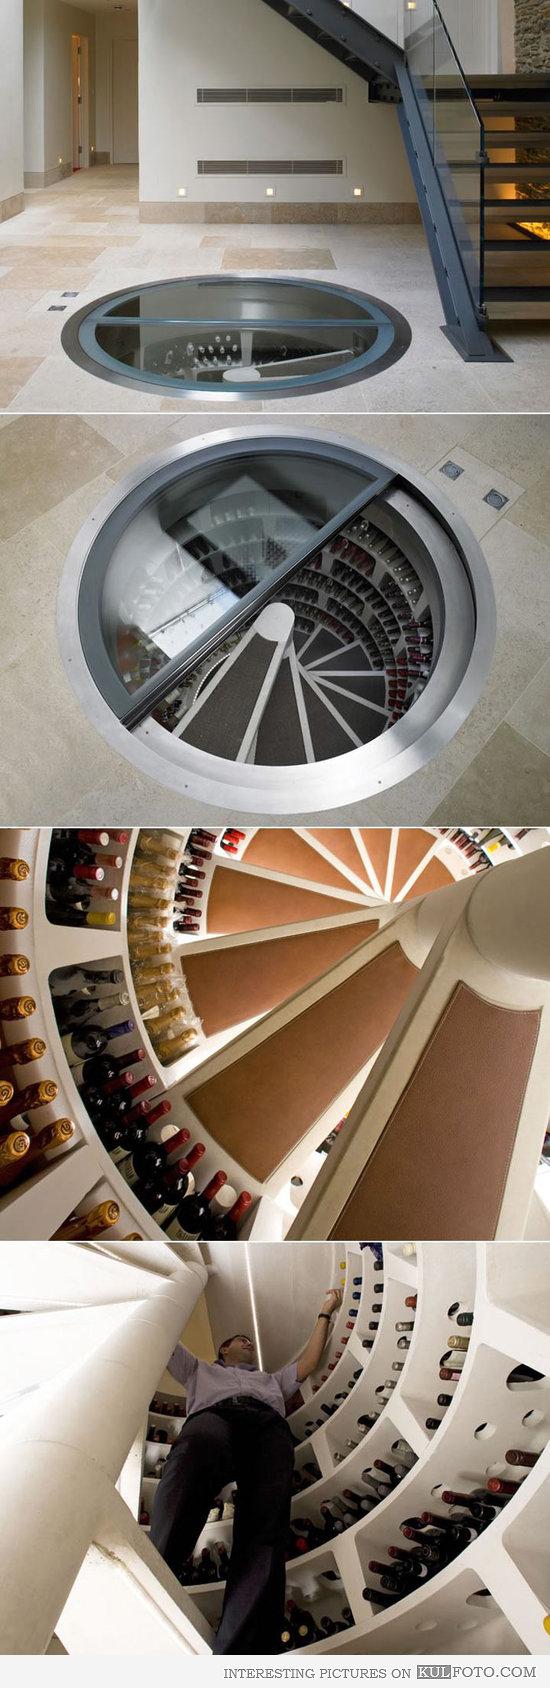 Wine Cellar In The Floor Do Want Dream Home Design Pinterest  # Muebles Rico Bejar